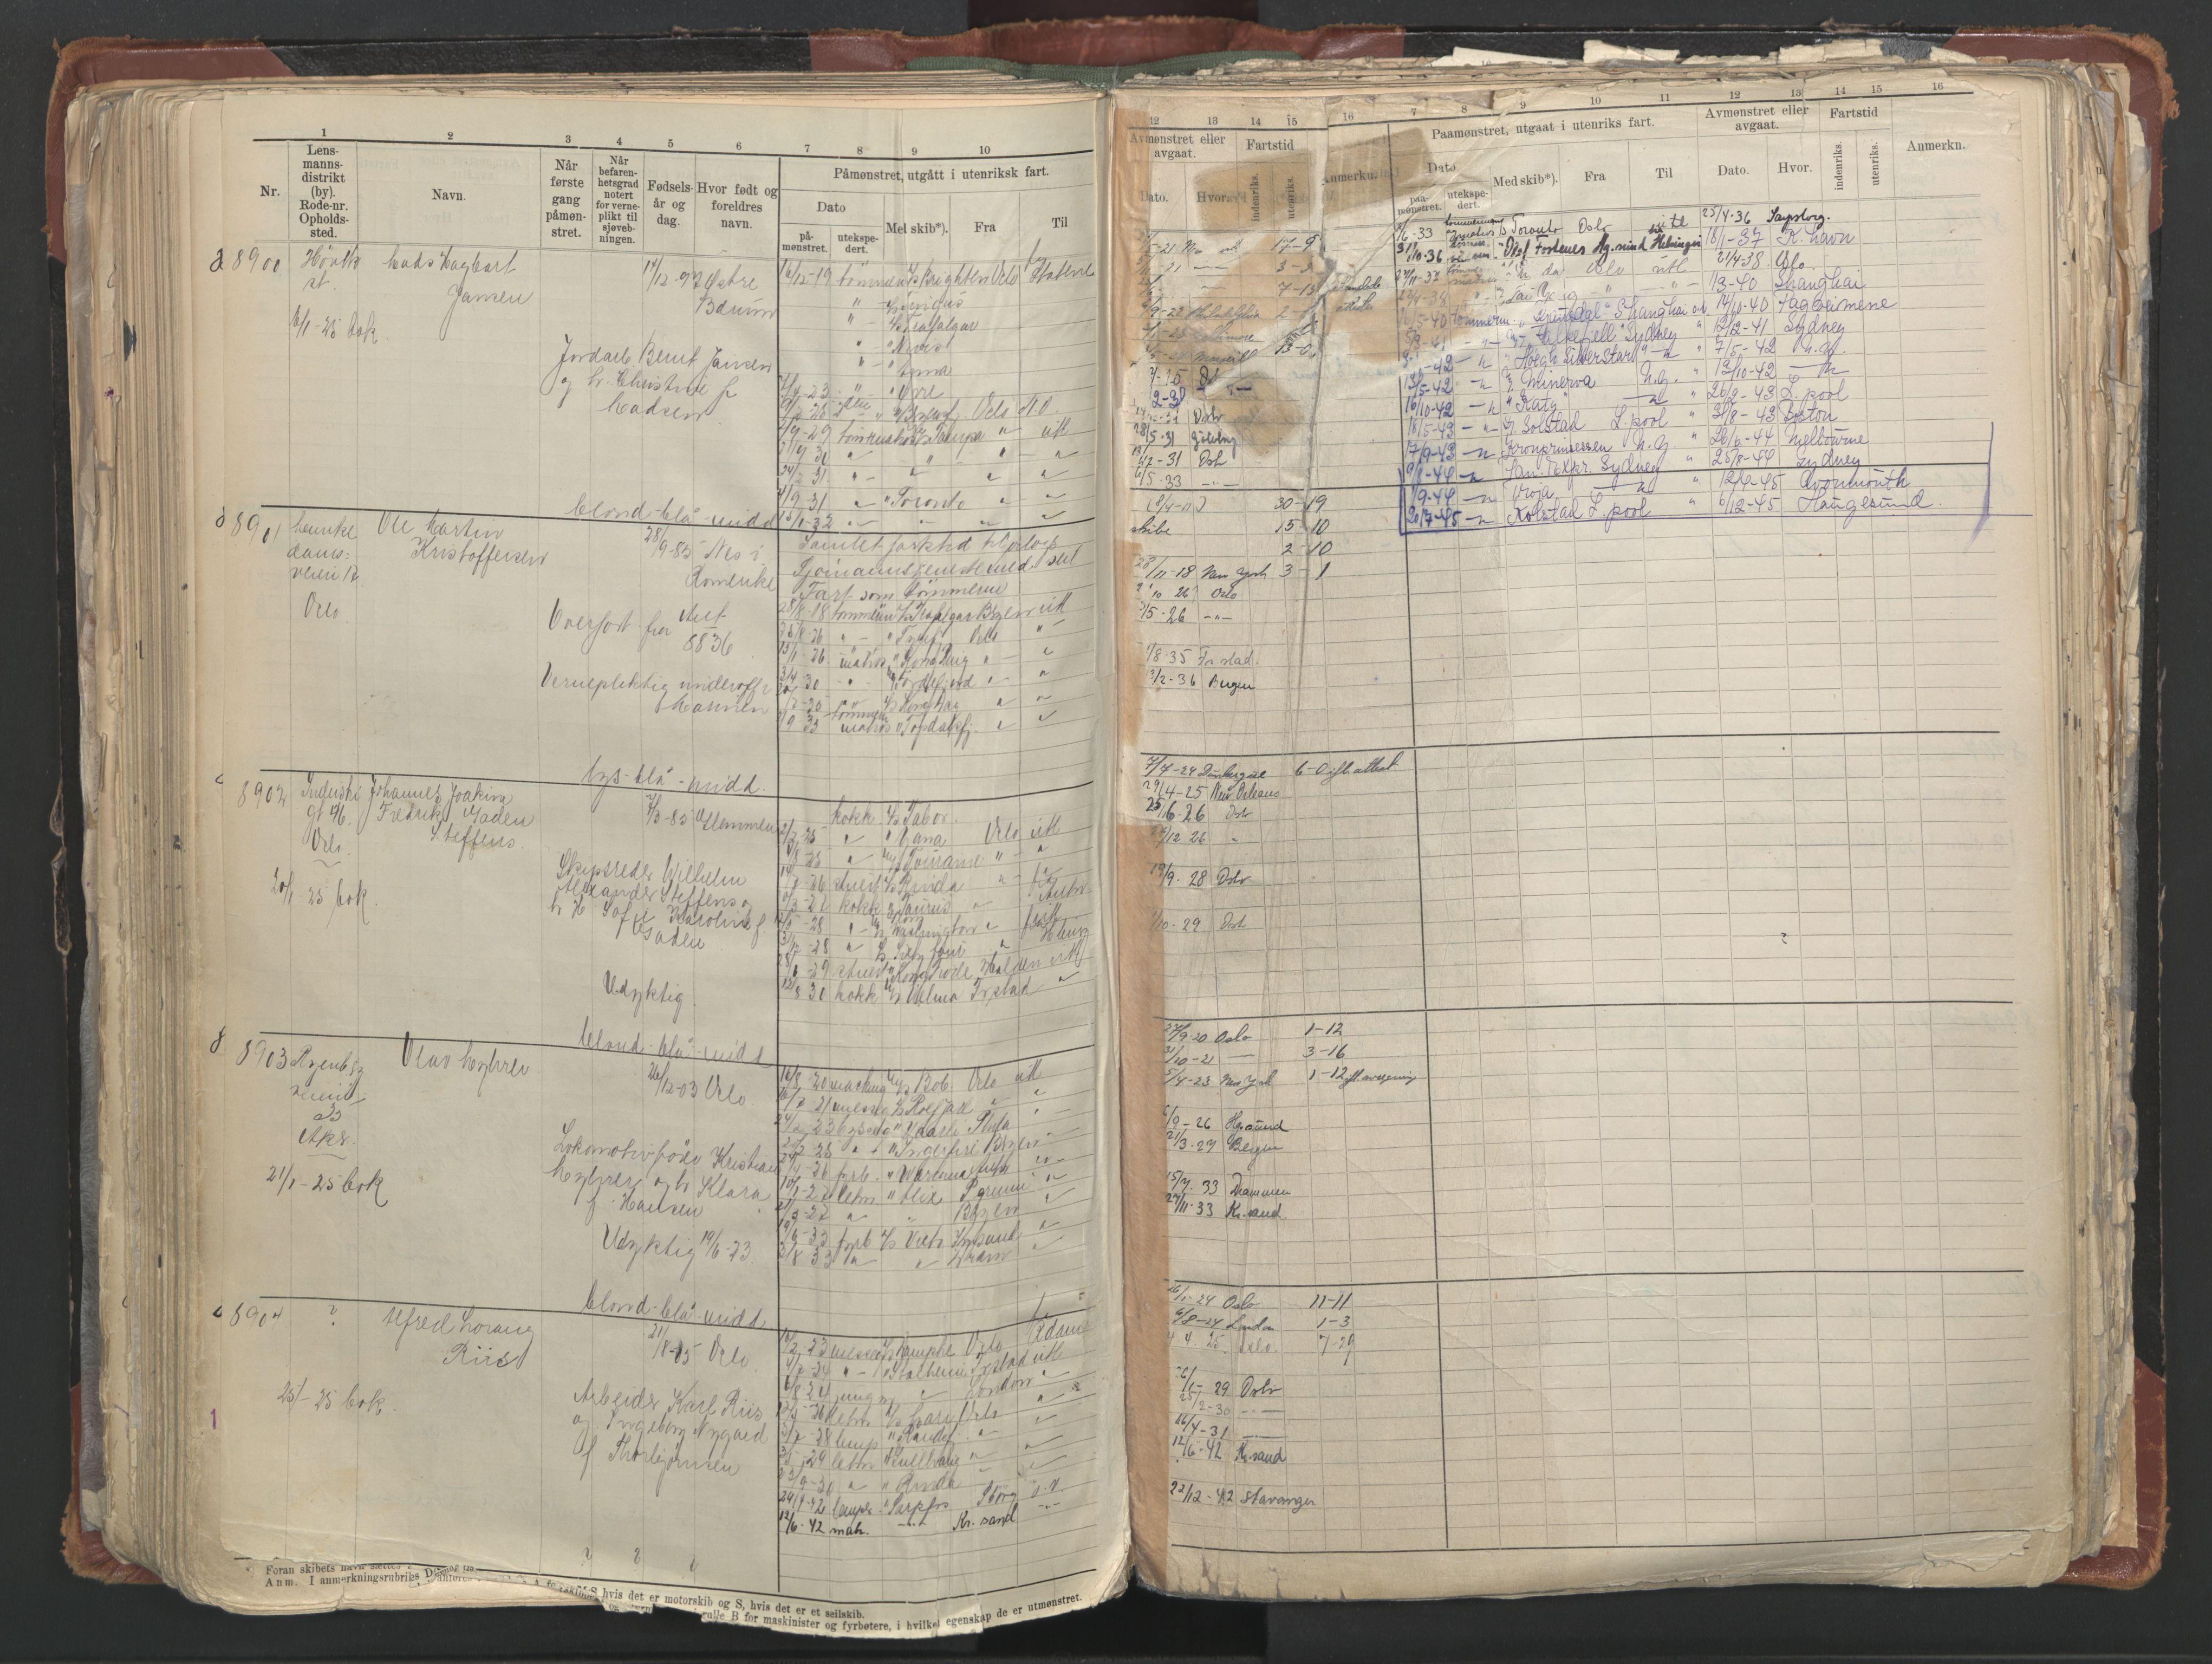 SAO, Oslo sjømannskontor, F/Fc/L0006: Hovedrulle, 1918-1930, s. 272